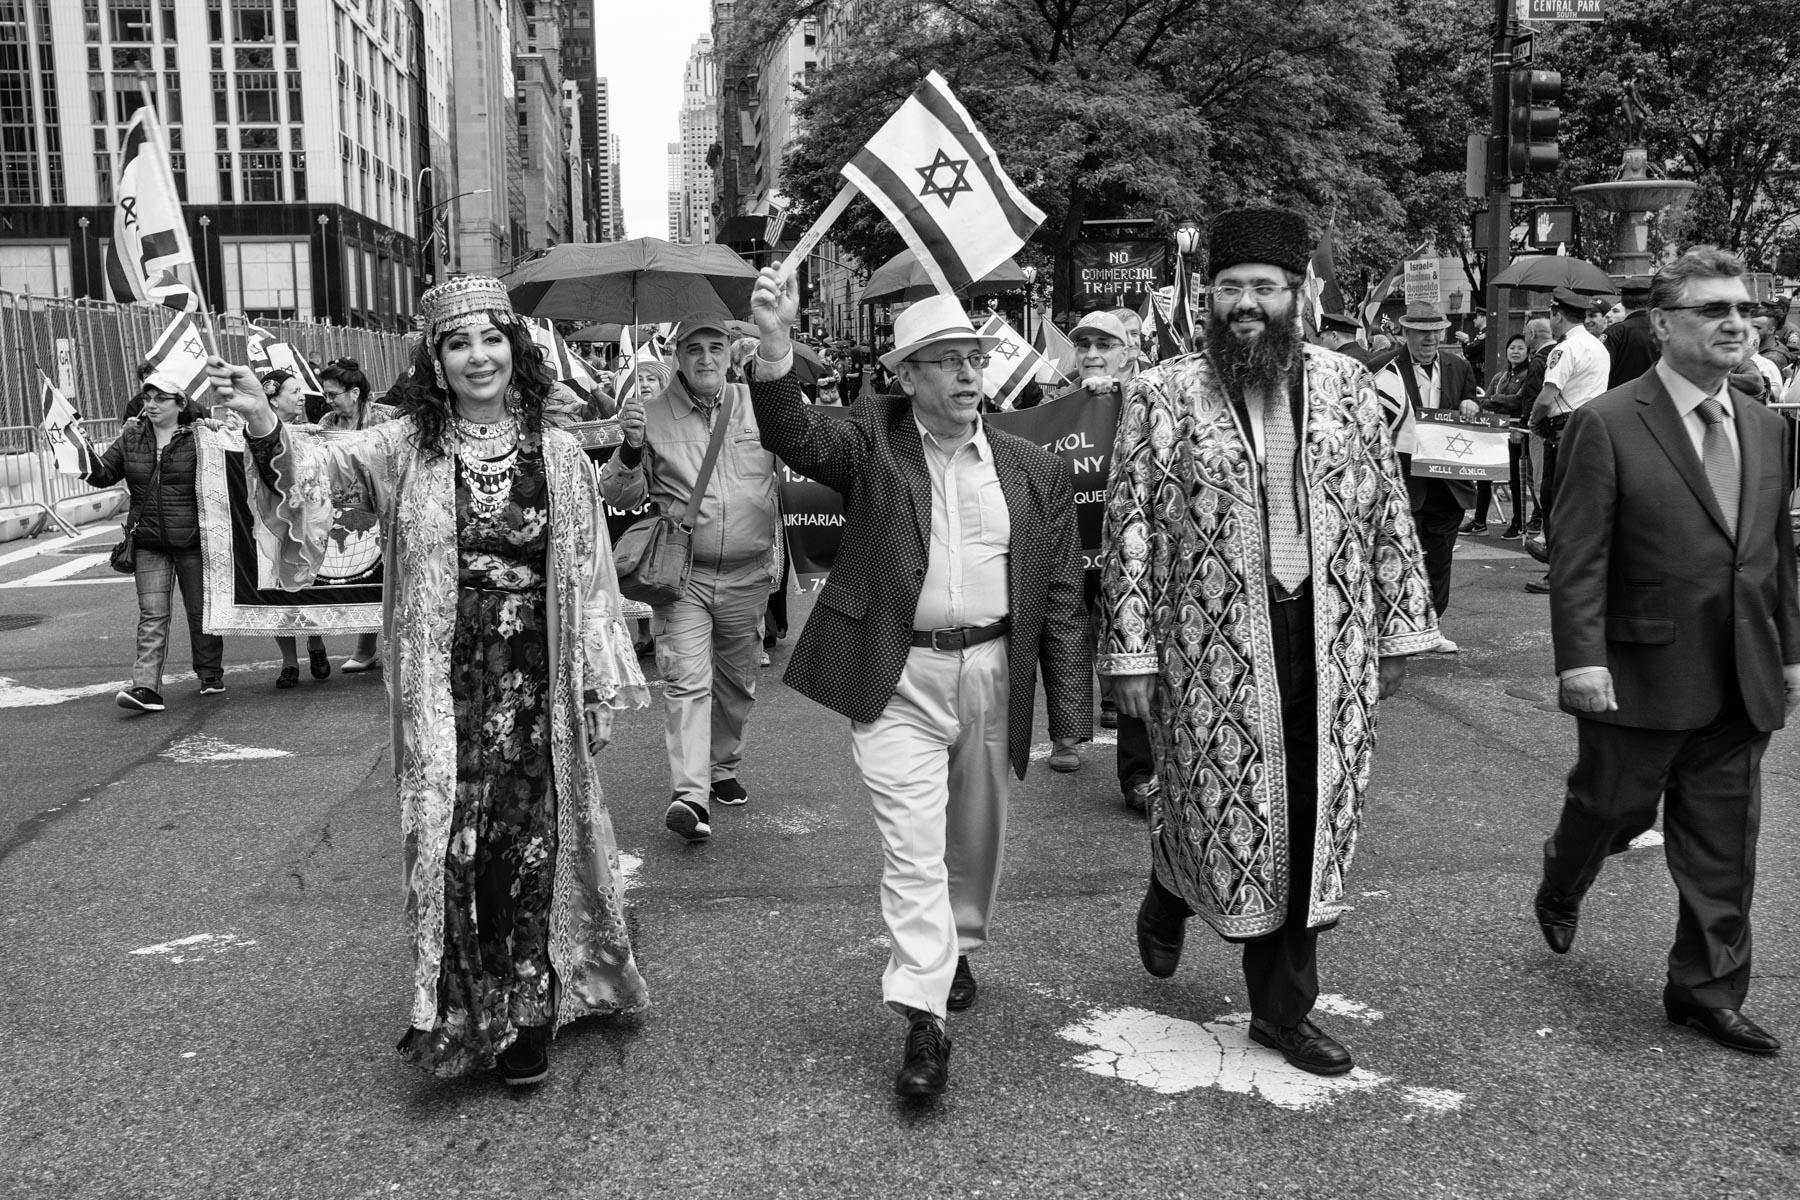 Israel Parade, New York City 06/04/17